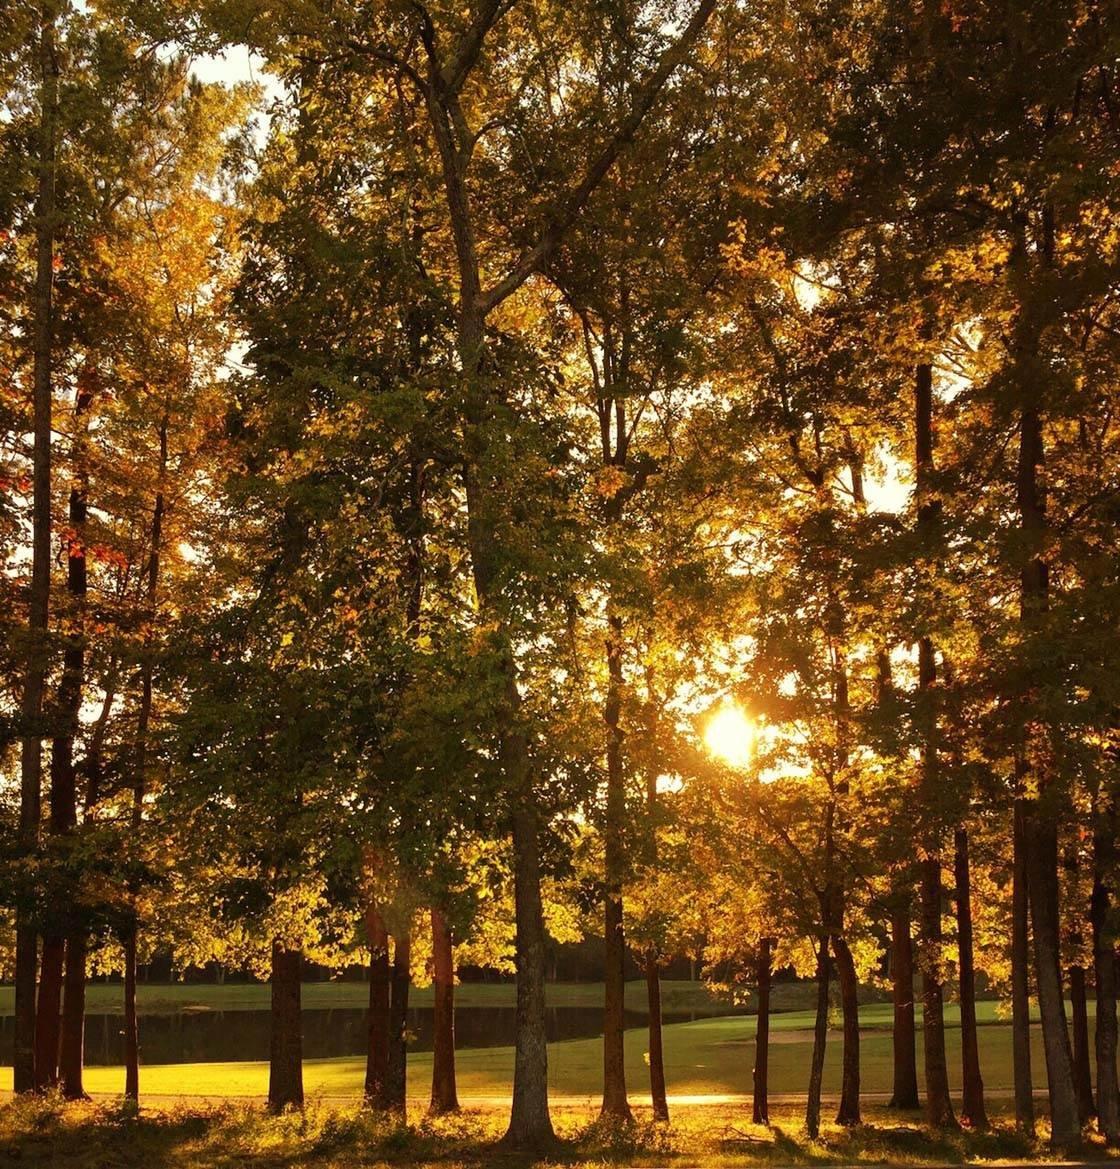 Landscape Scenery iPhone Photos 11 no script